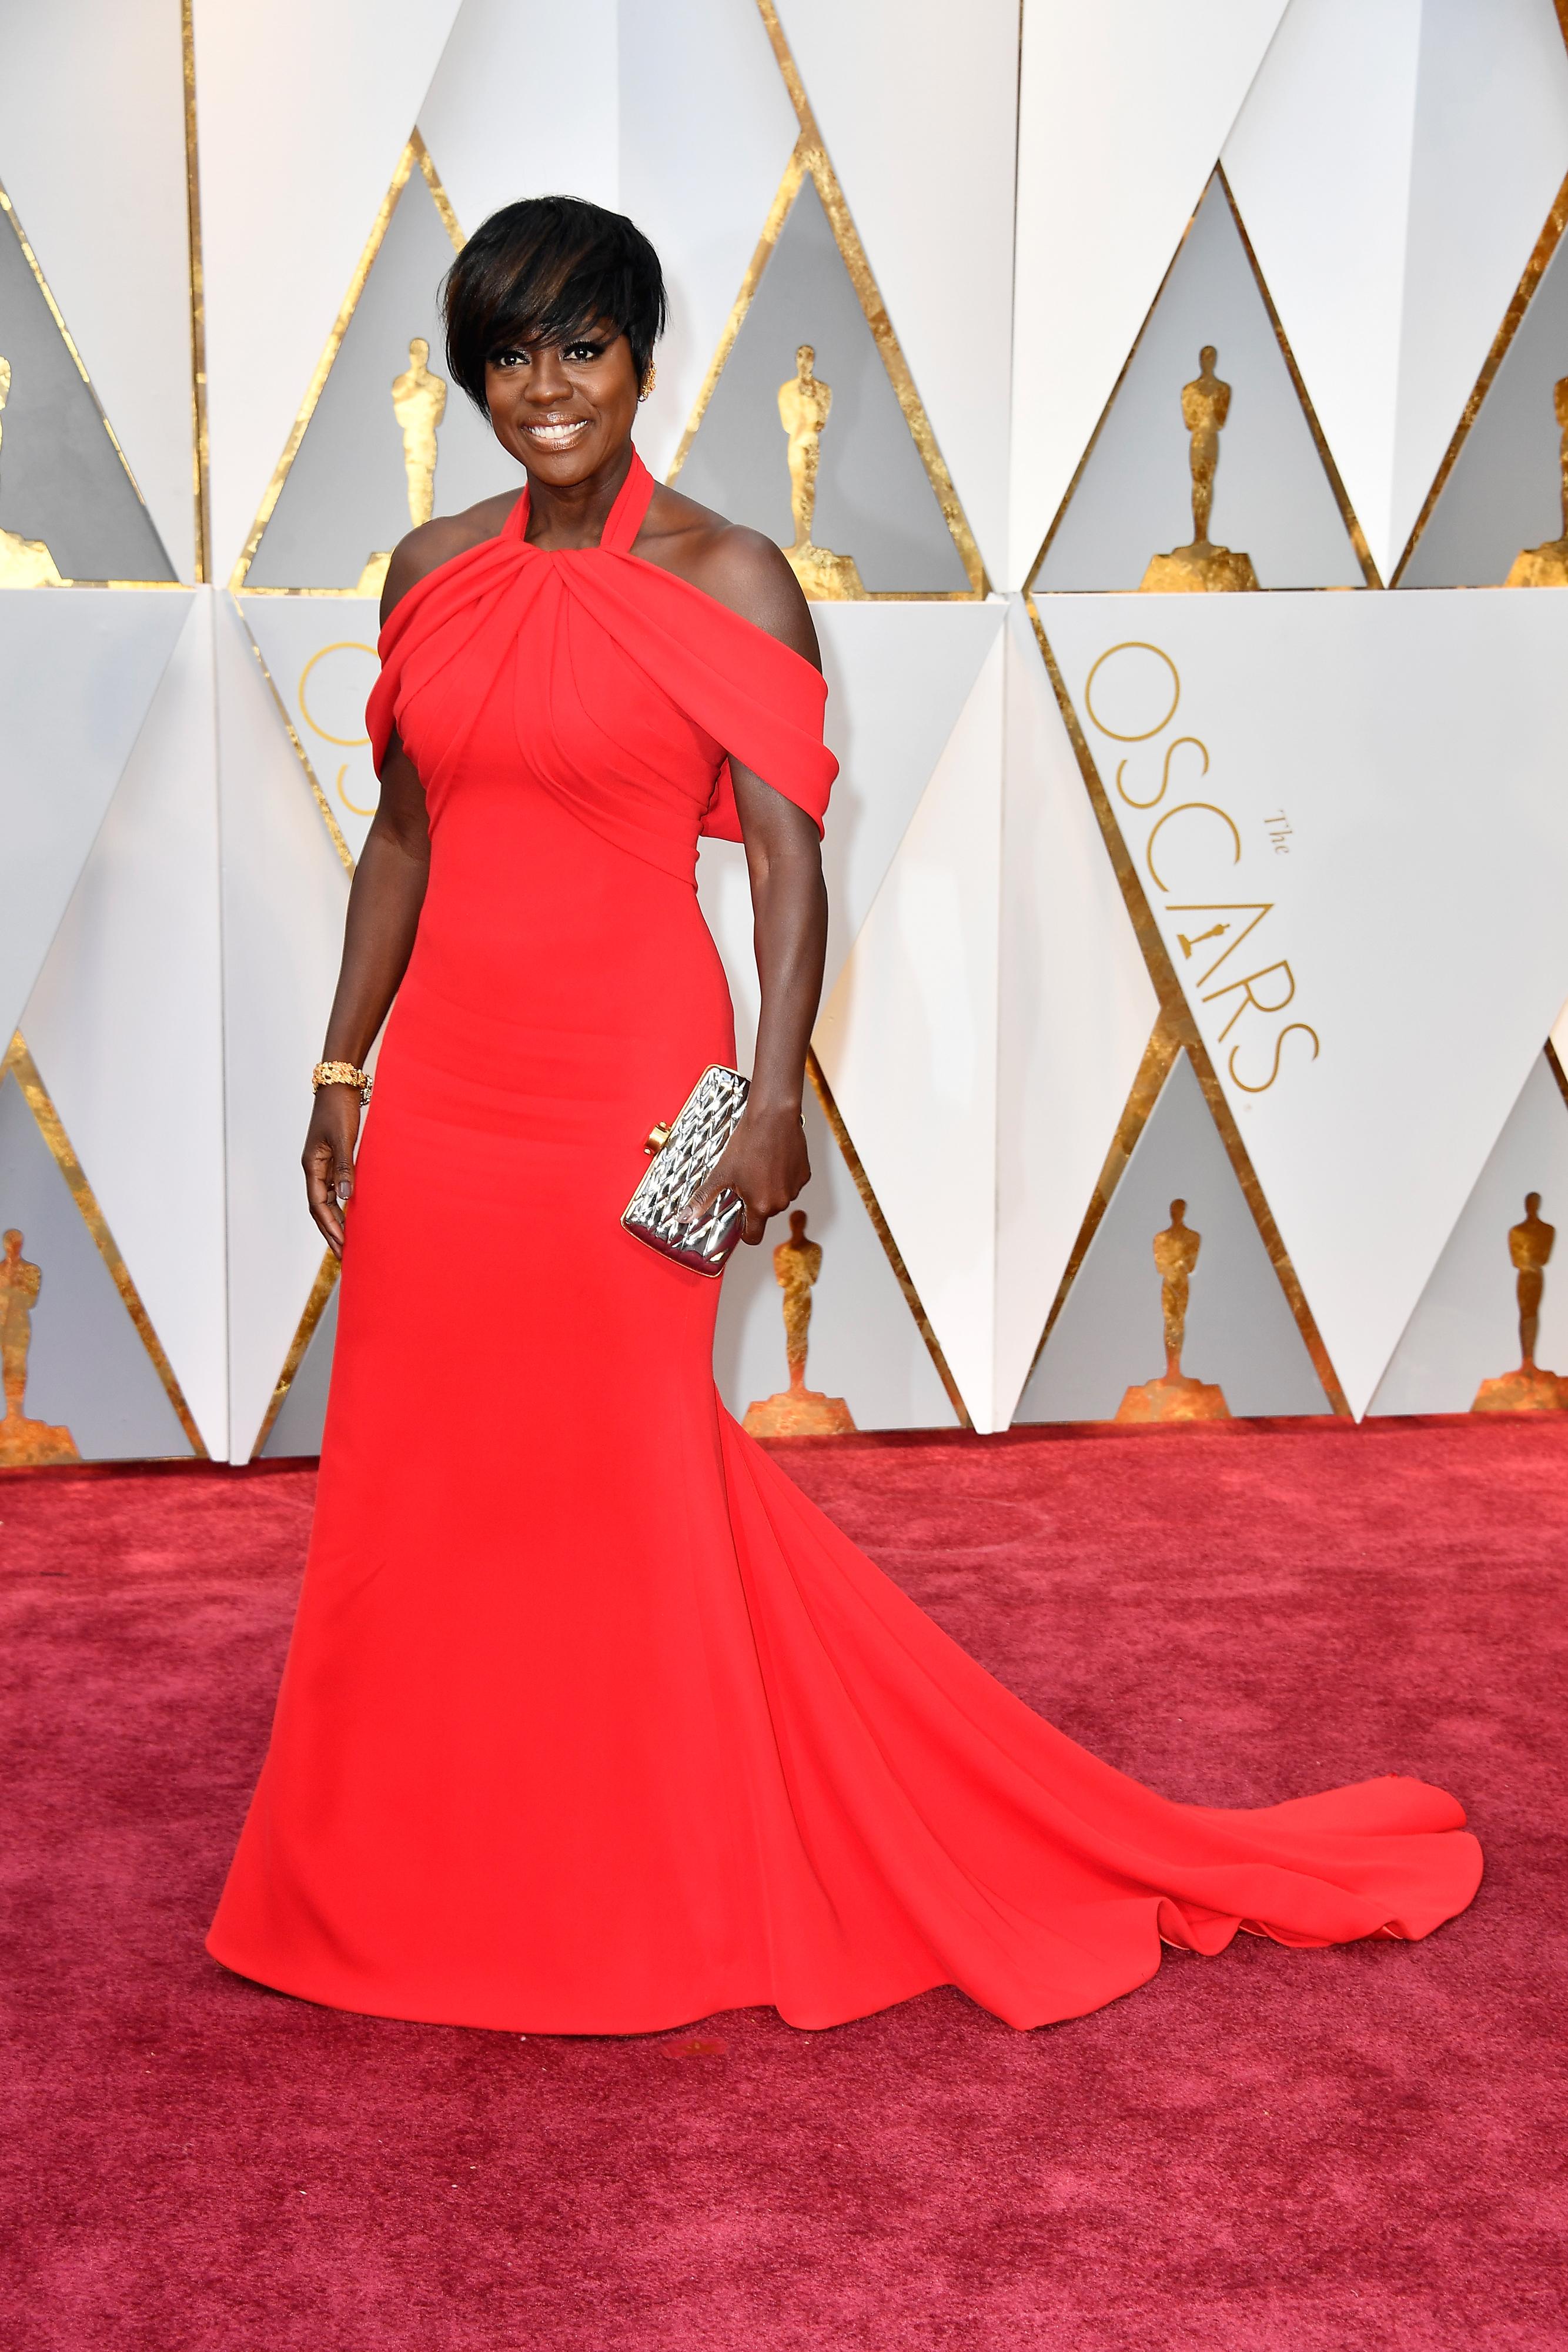 An Image of Viola Davis at the 2017 Oscars